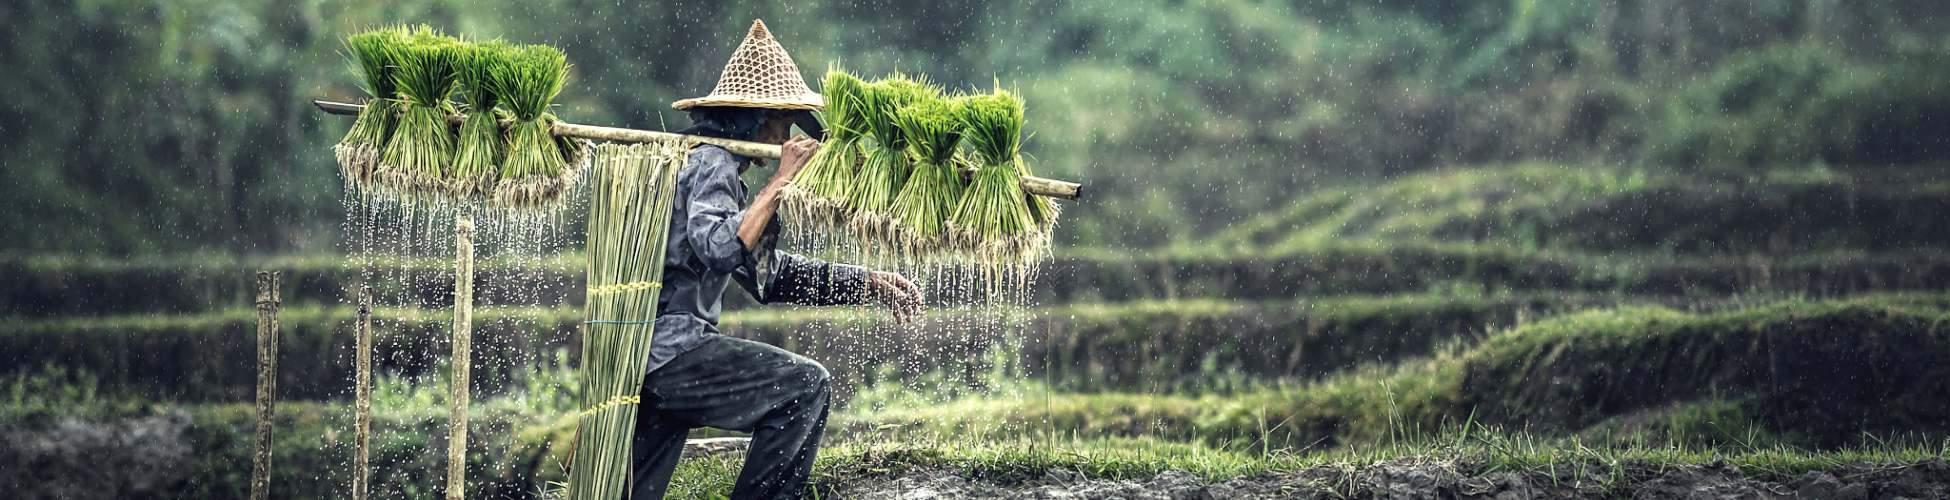 cambodian-countryside-battambang-rice-paddies-adventure